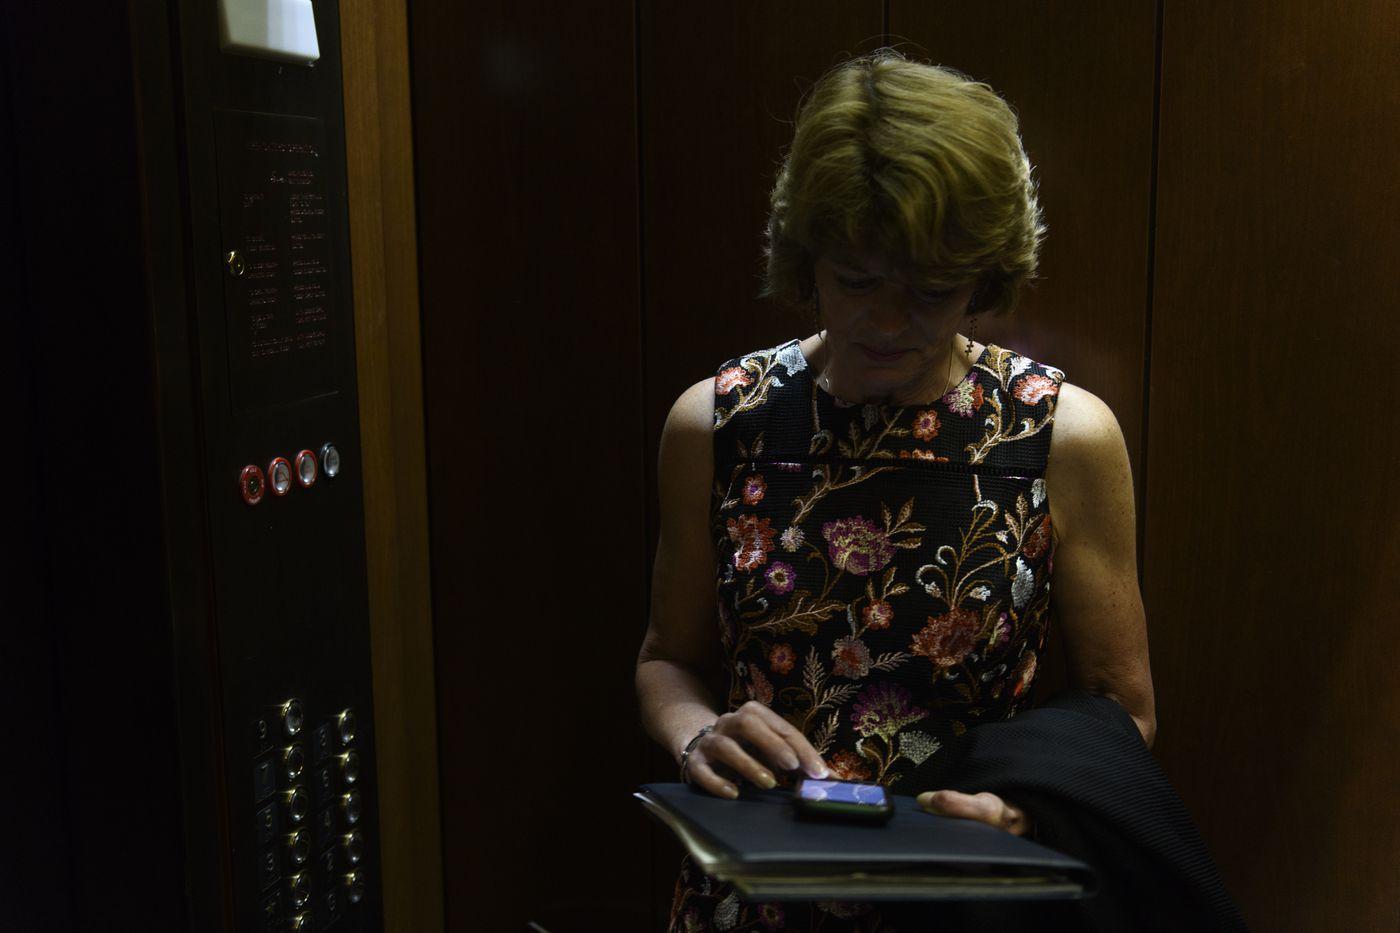 Sen. Lisa Murkowski rides a senators-only elevator toward voting in the Senate chamber on June 18, 2019. (Marc Lester / ADN)